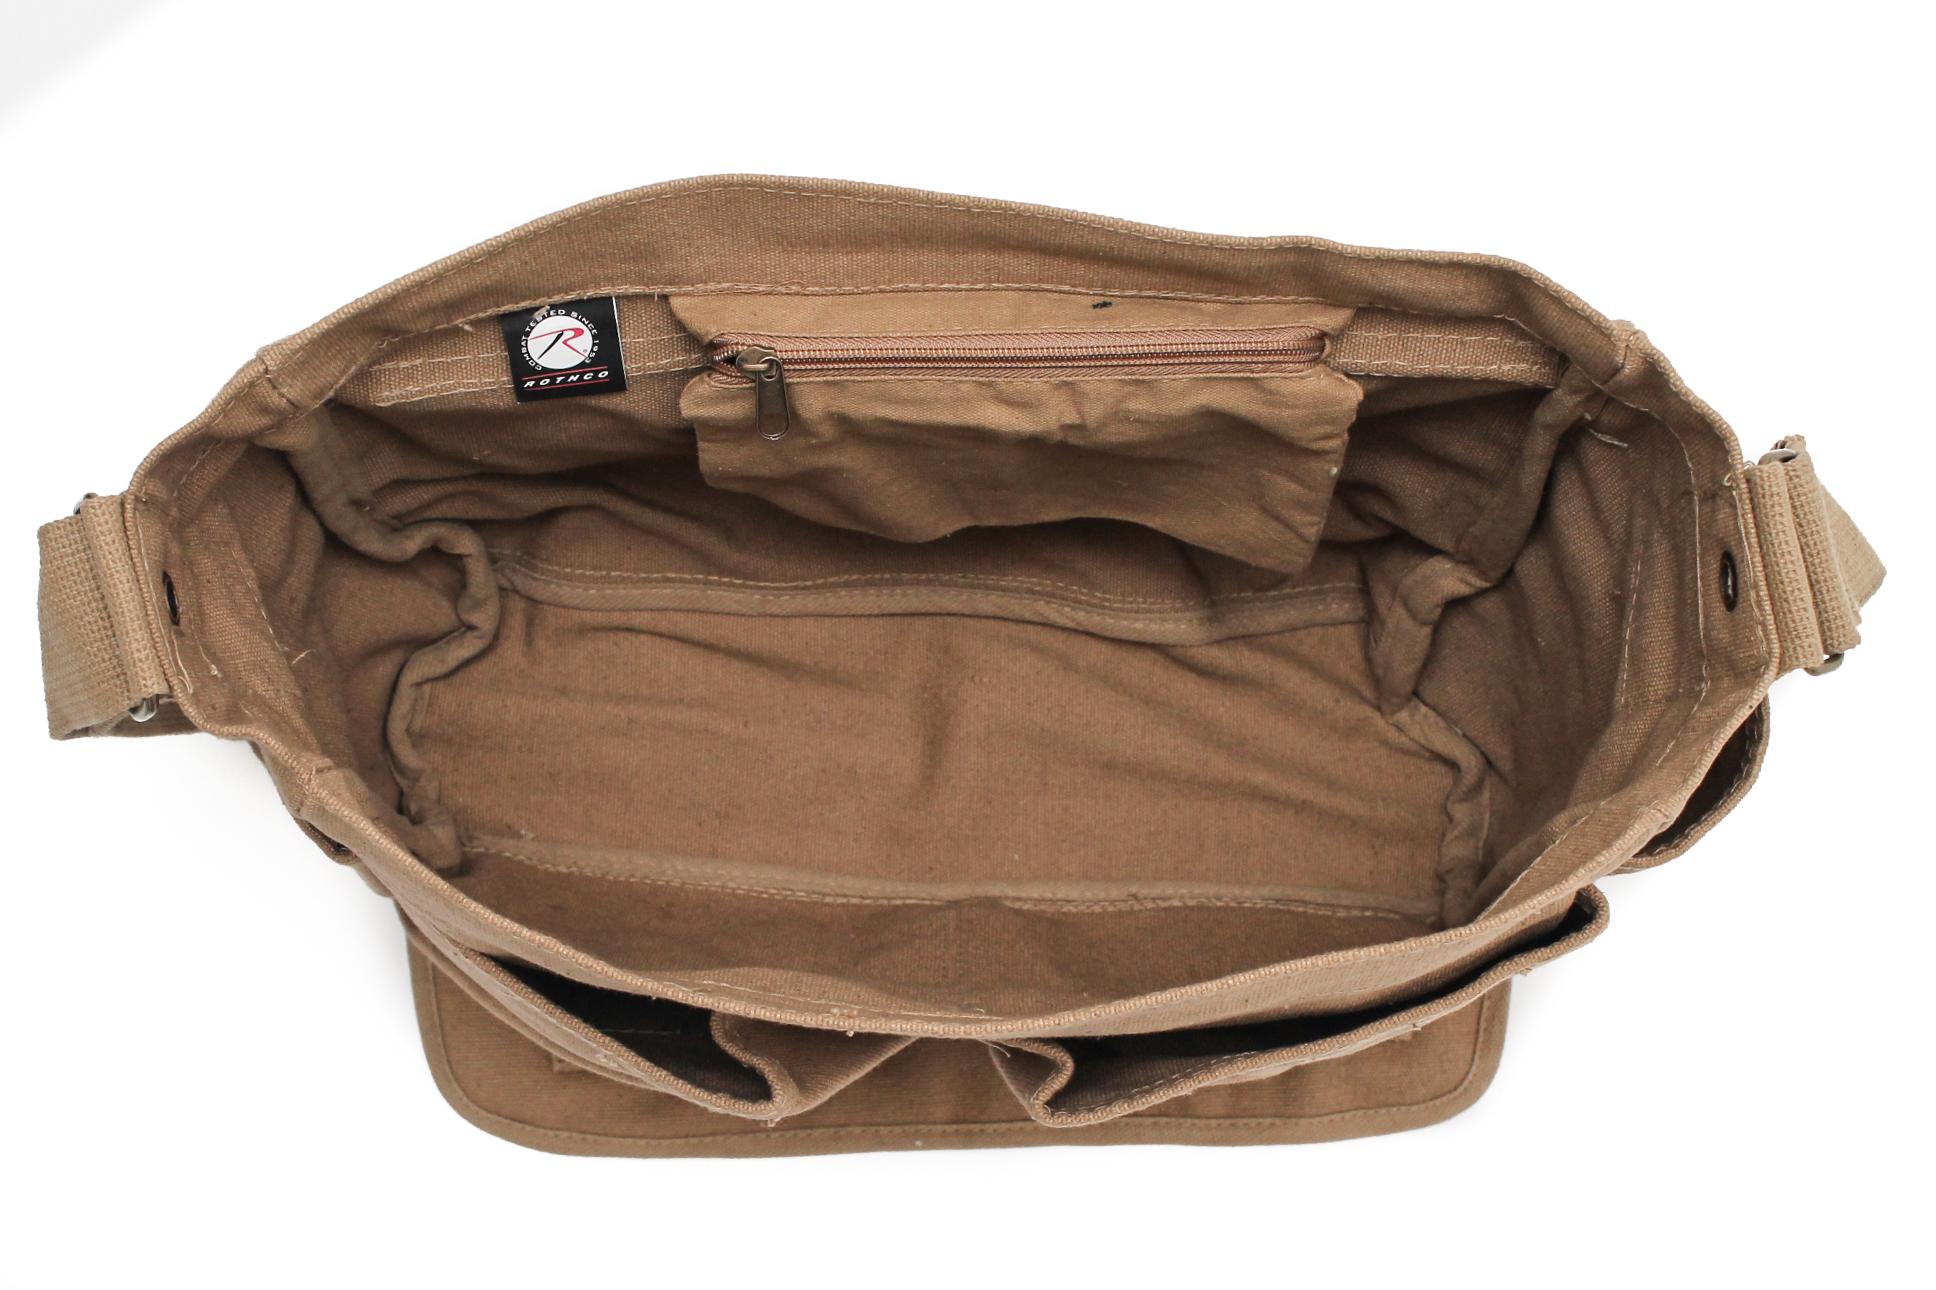 Pug Life Puppy Heavyweight Canvas Messenger Shoulder Bag